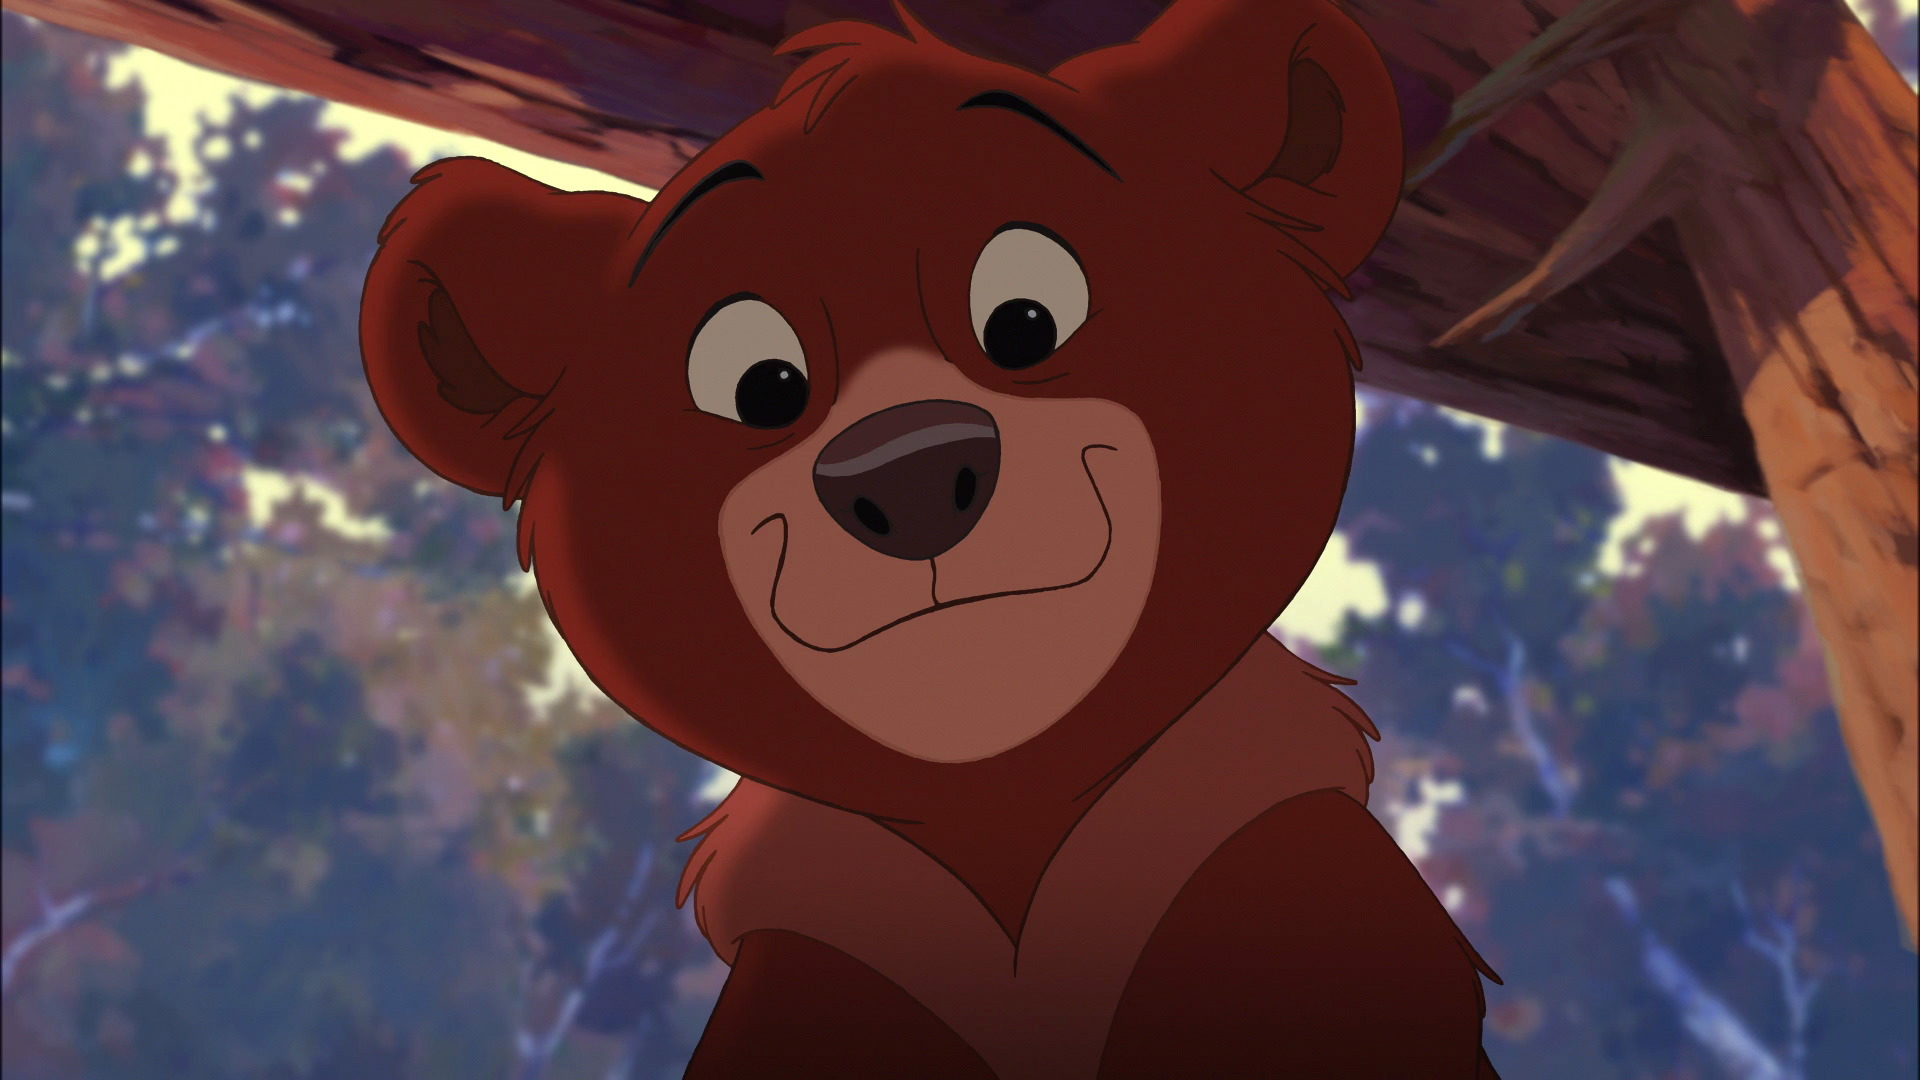 Dansk full bjørne brødre movie Disneys Bjørne